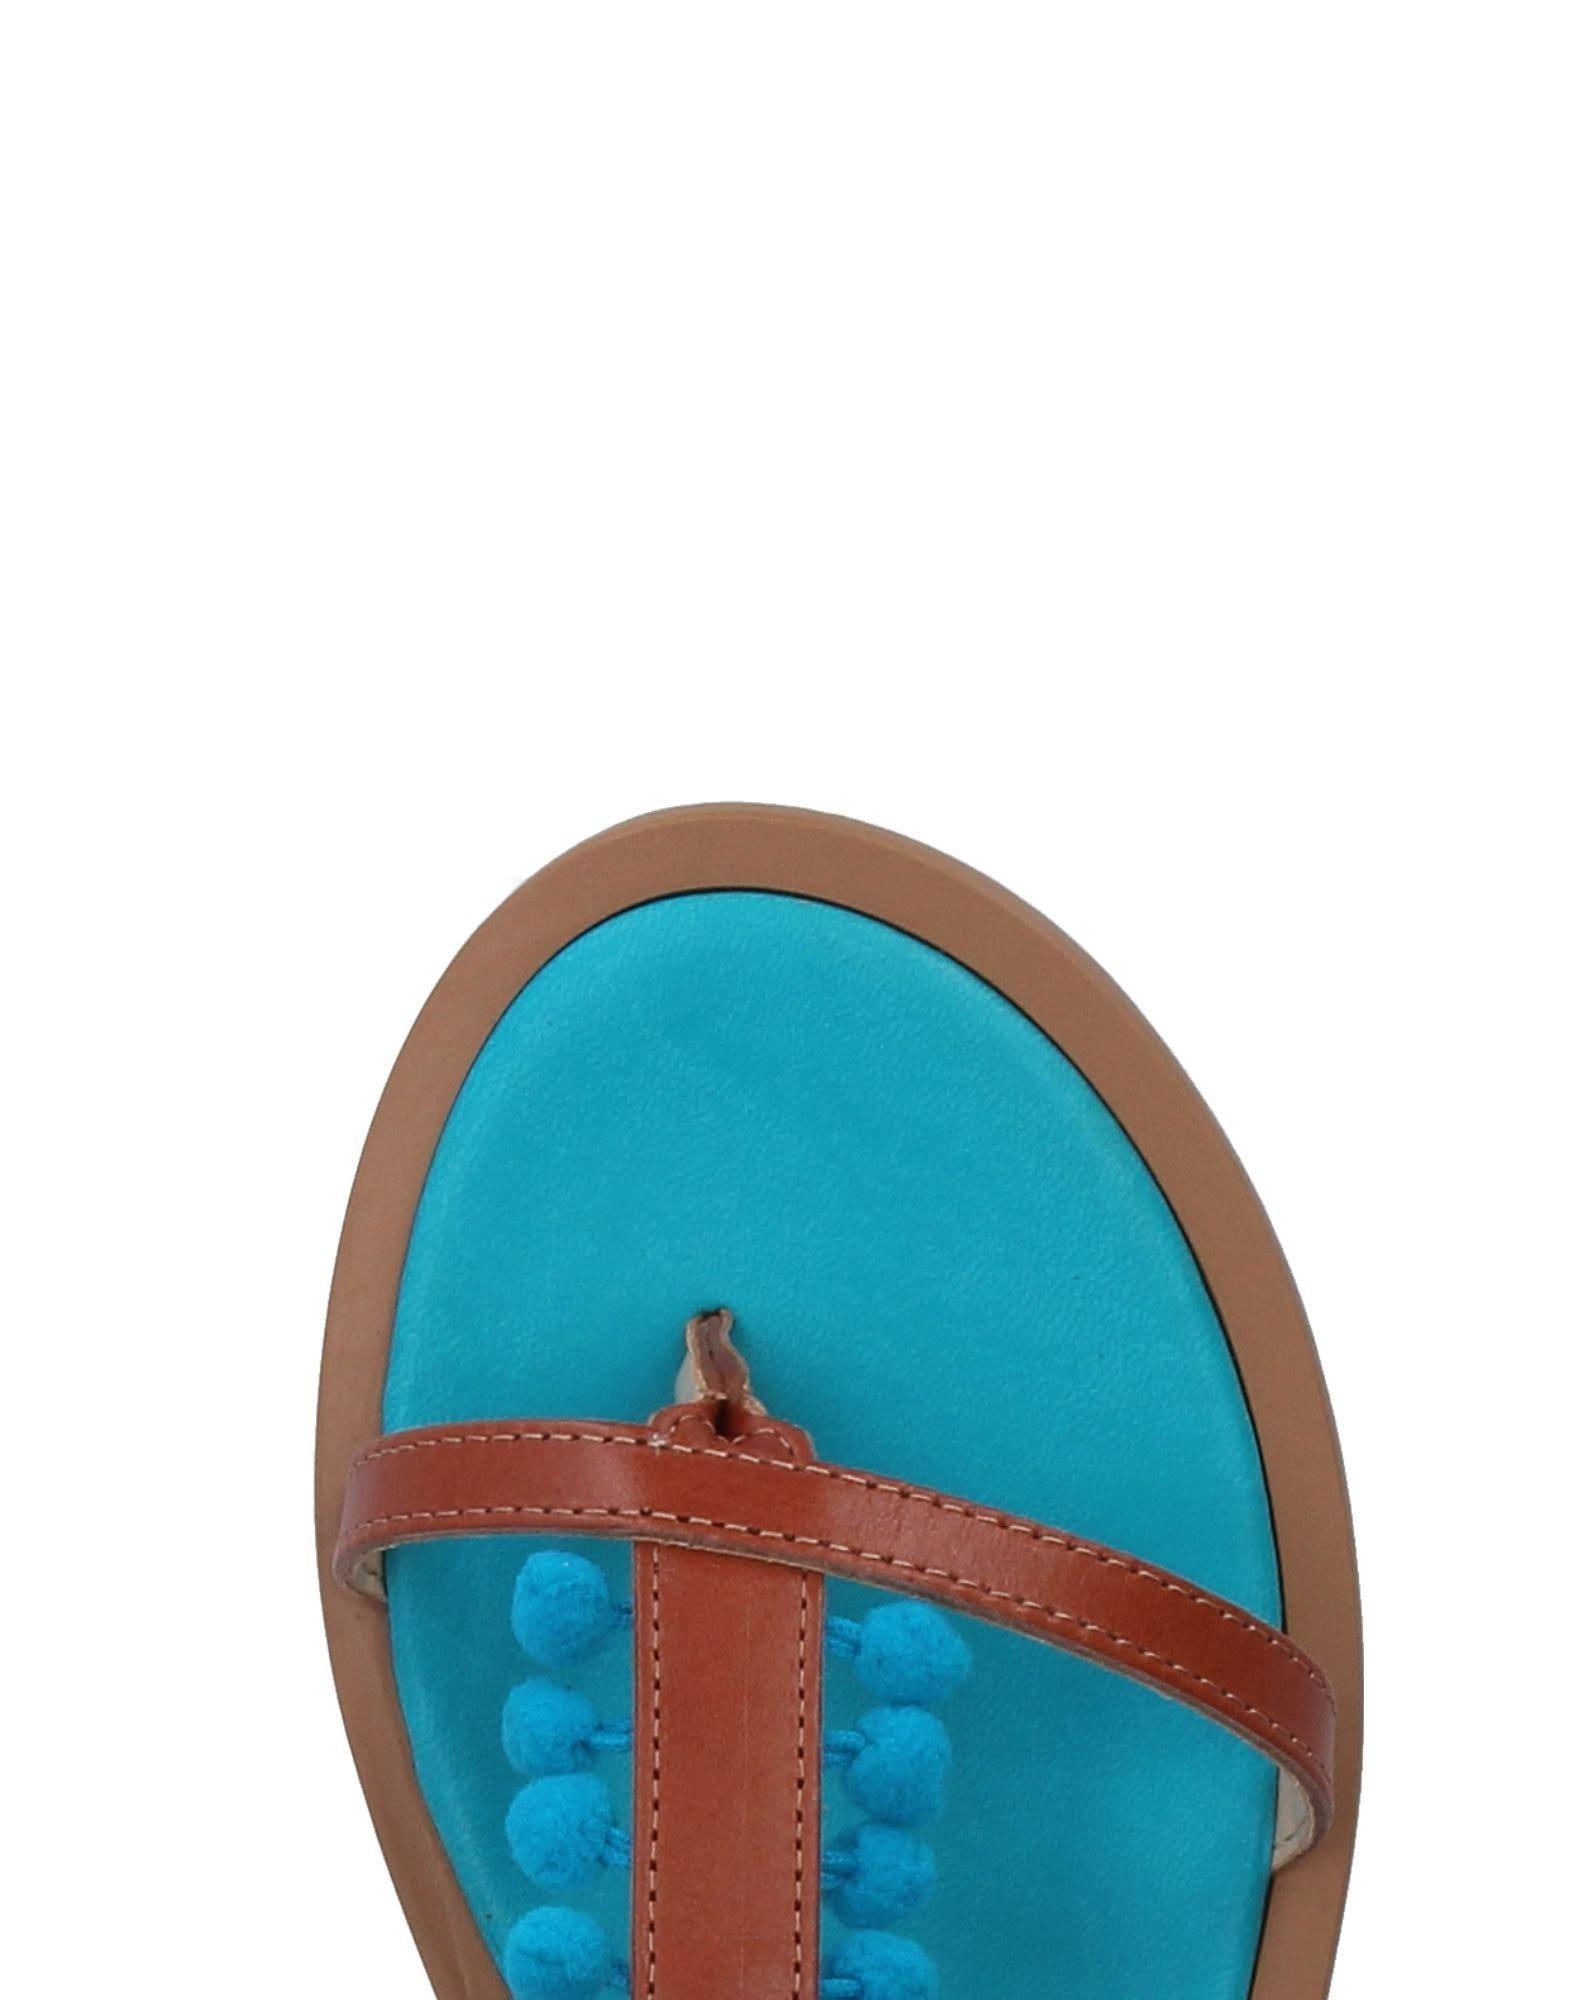 Pennyblack Dianetten Damen  11367265DT Gute Qualität beliebte Schuhe